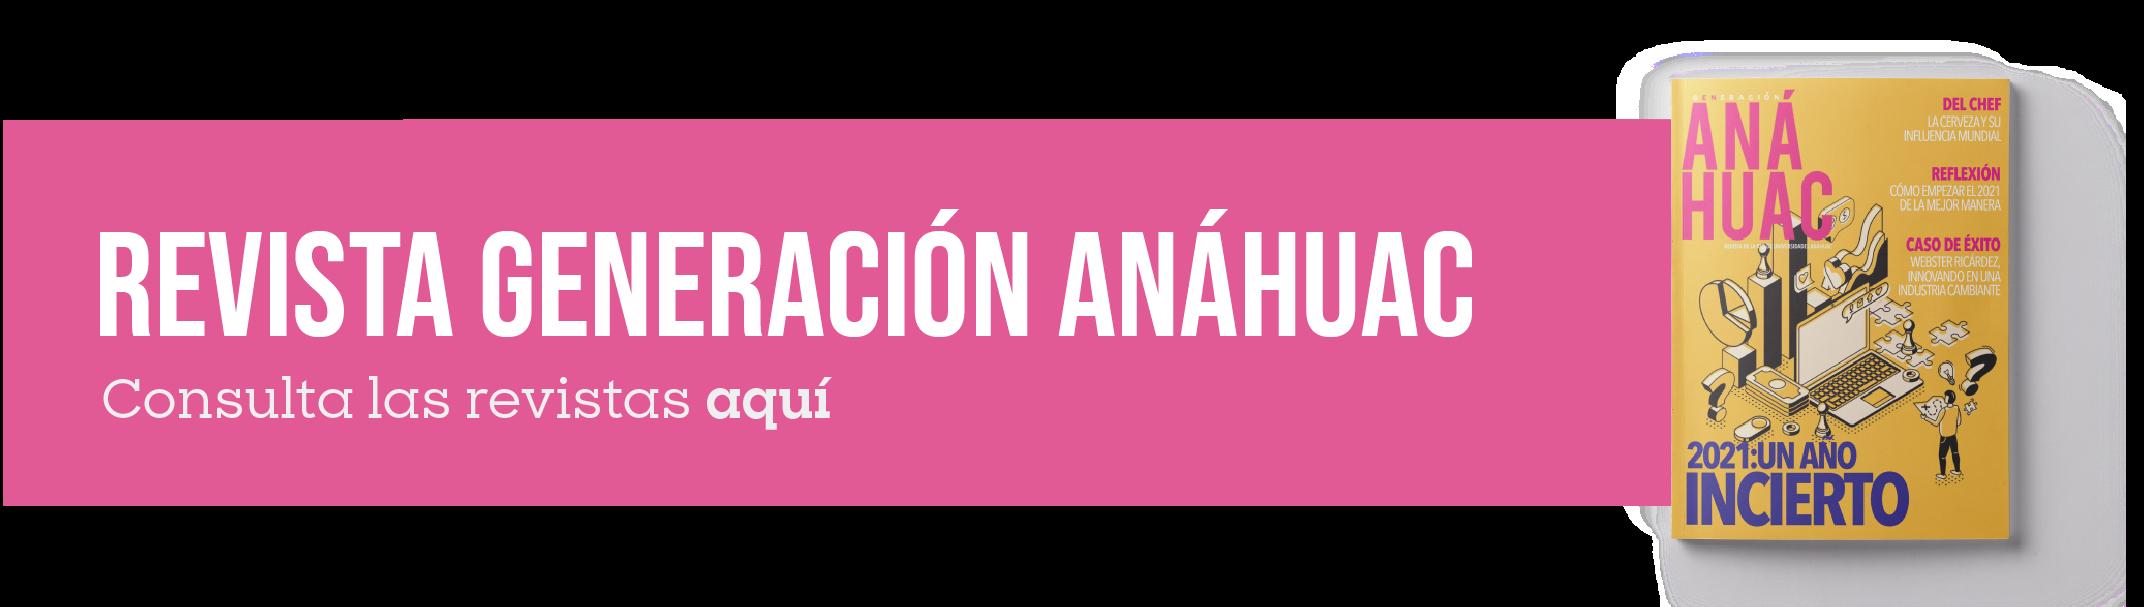 cta-revista-generacion-anahuac